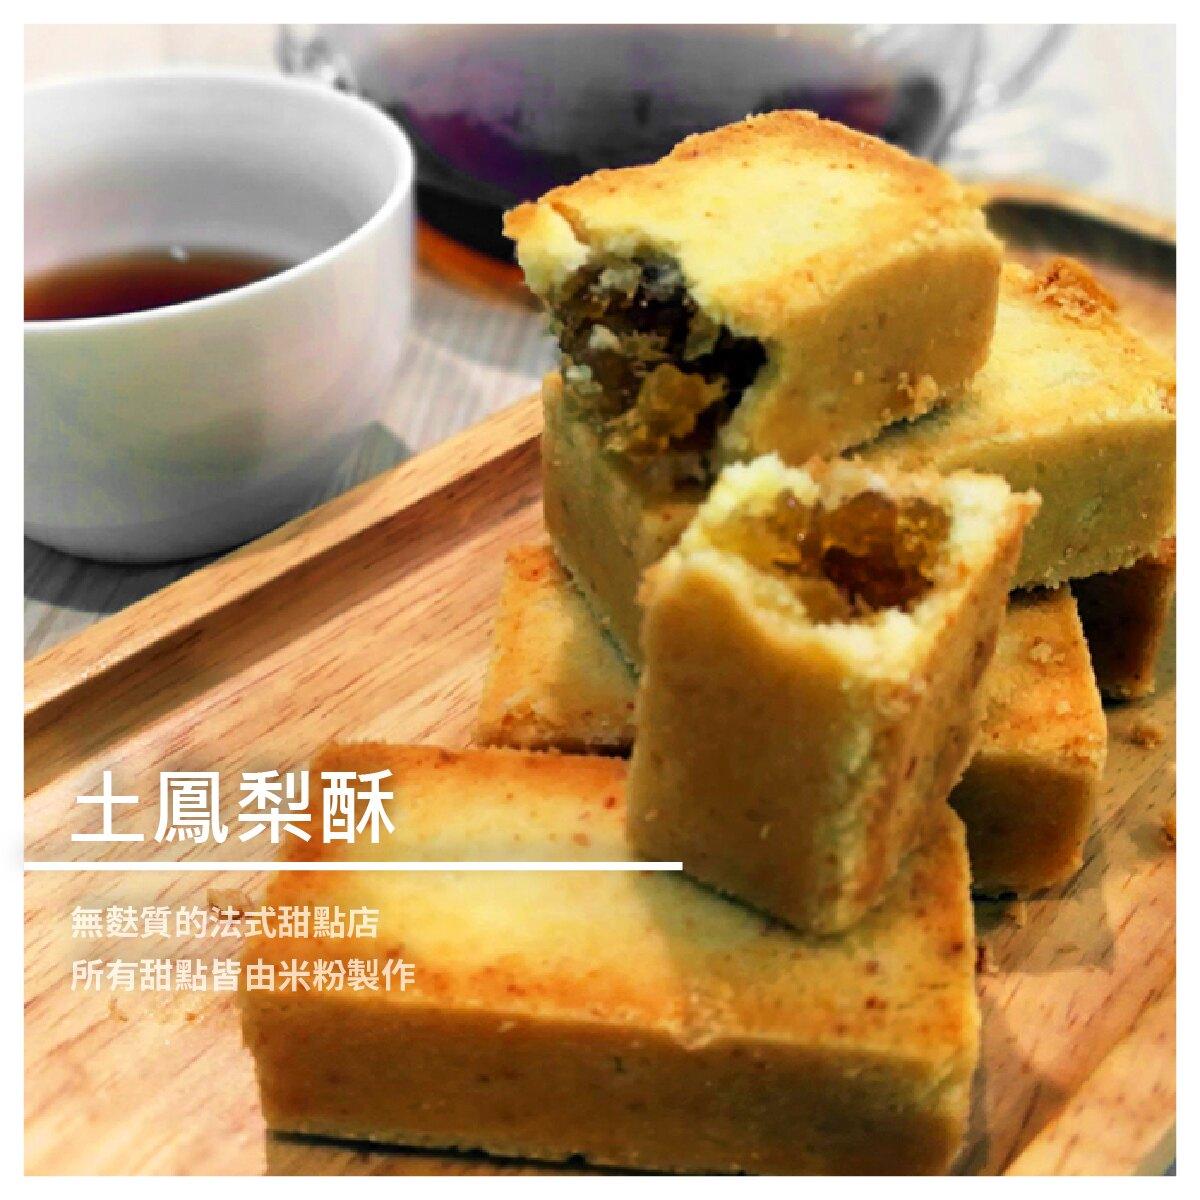 【Domus幸福洋菓子】土鳳梨酥 10入